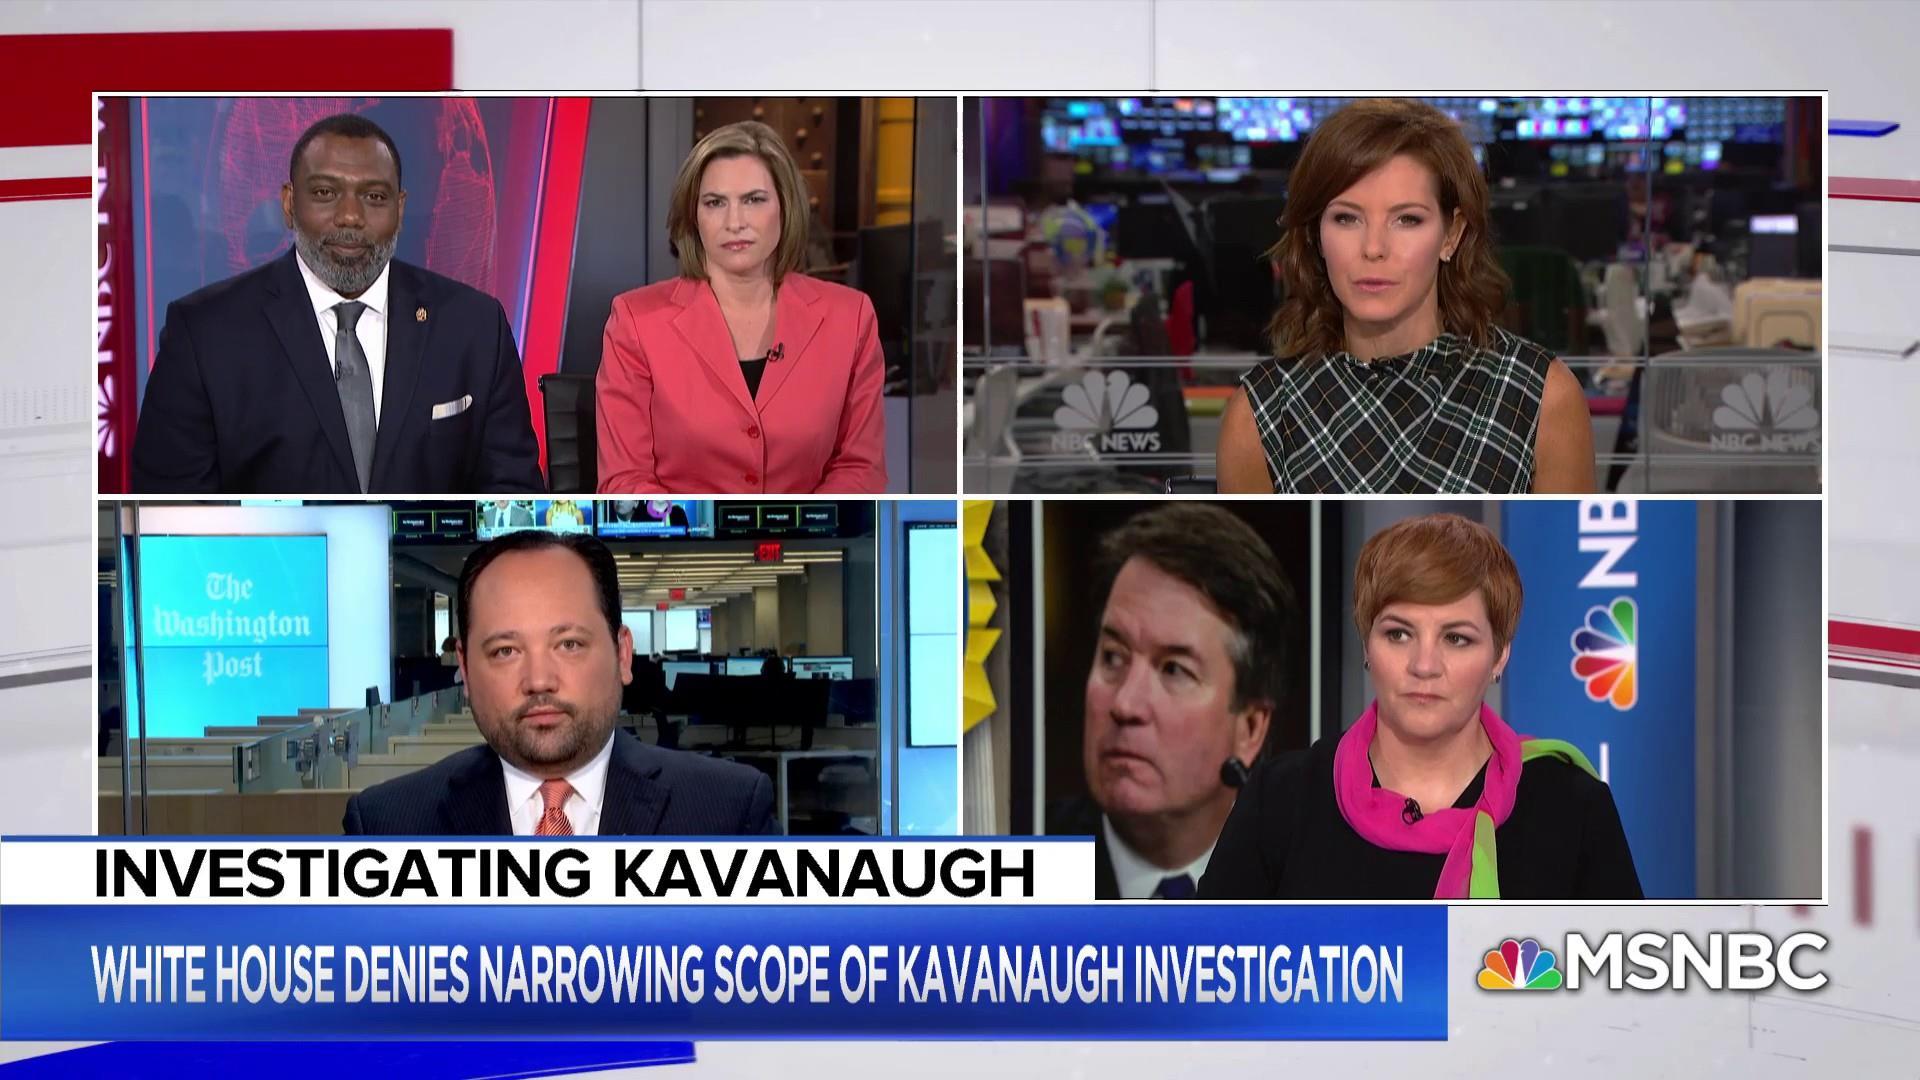 Republican strategist: Brett Kavanaugh disqualified himself